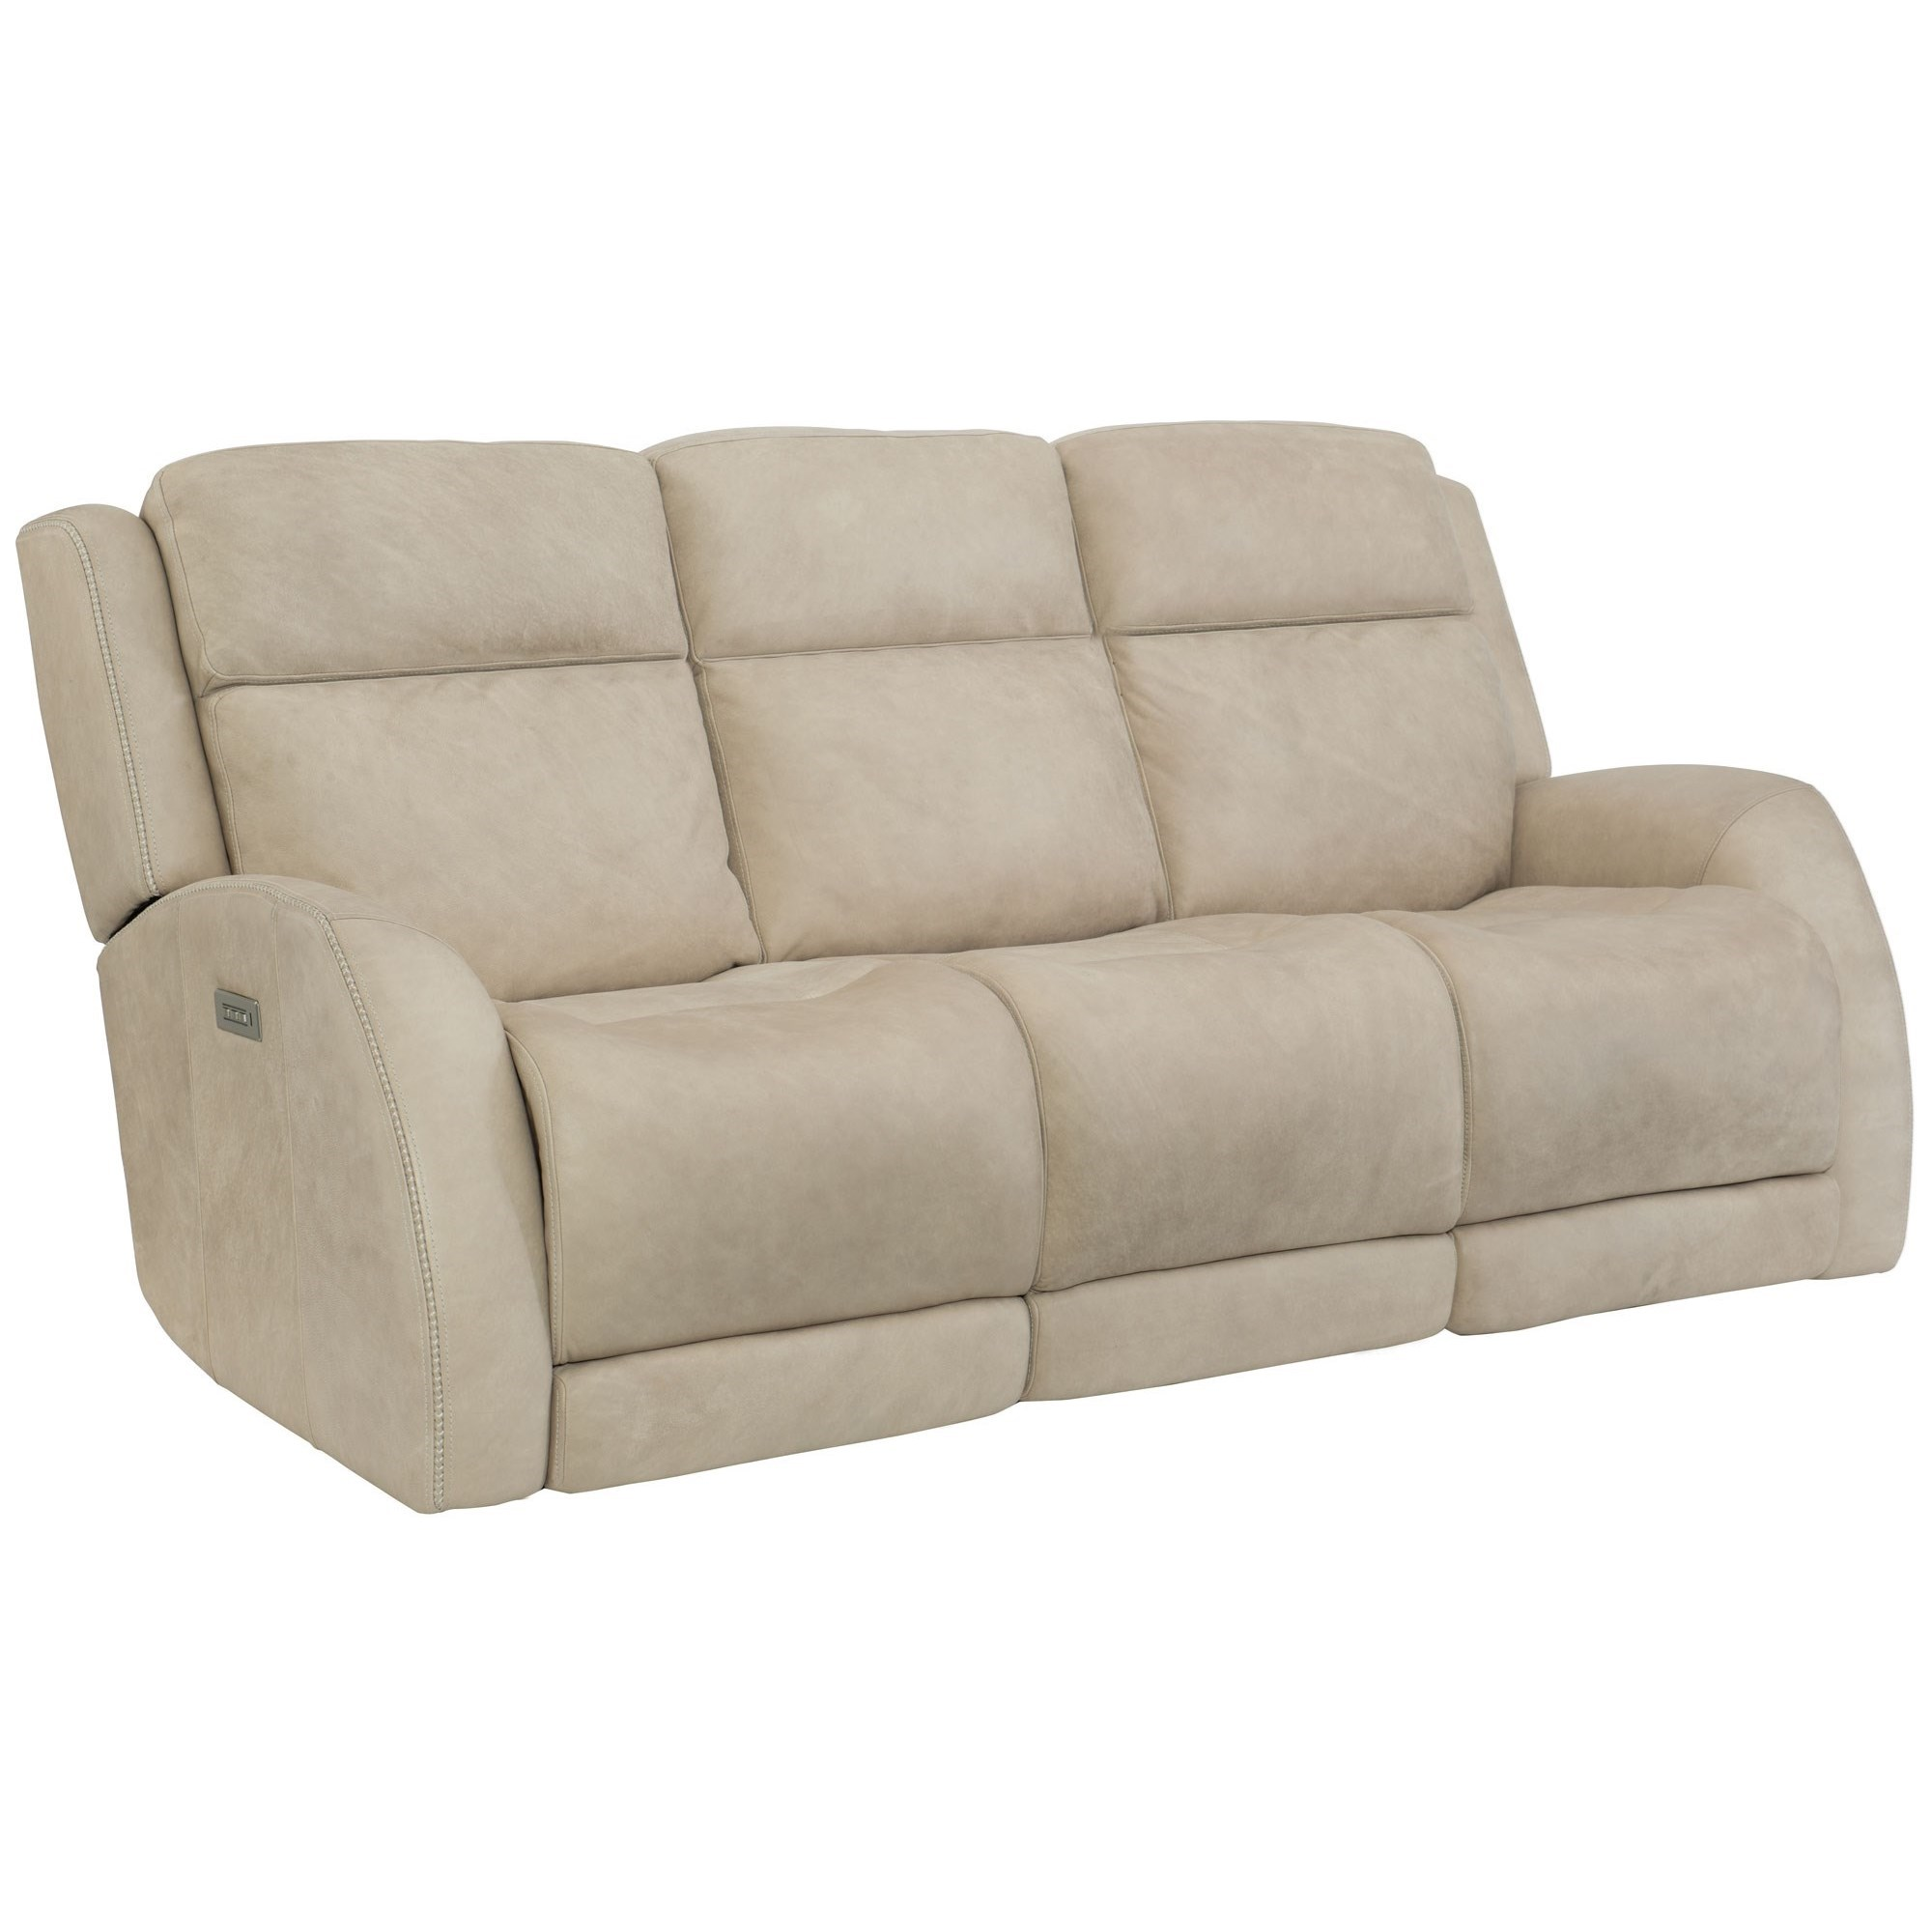 Bernhardt Rawlings Casual Power Reclining Sofa With Power Headrest Lumbar And Usb Charging